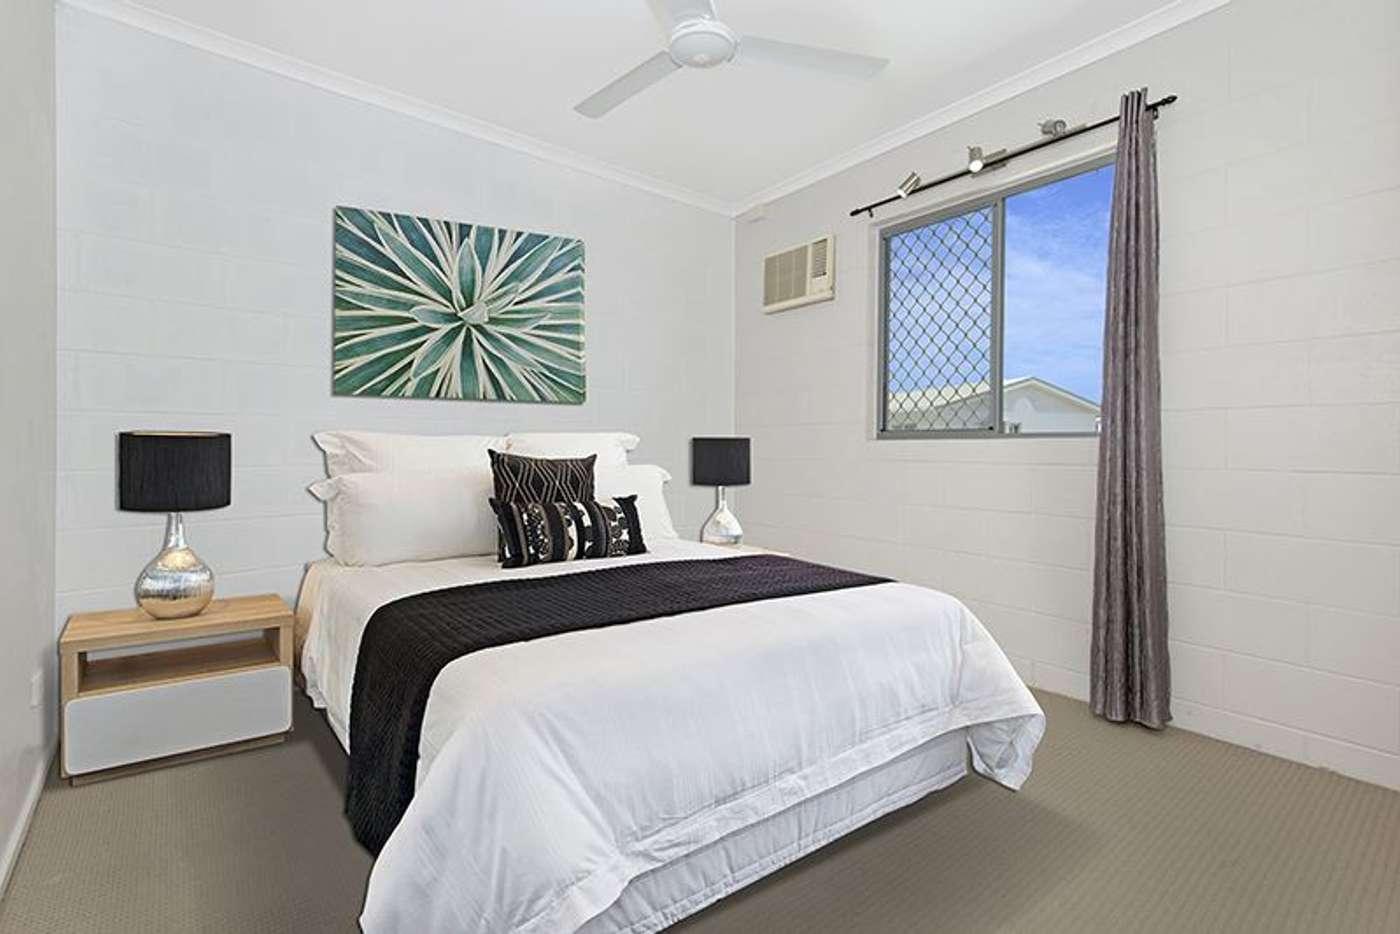 Sixth view of Homely unit listing, 9/21-23 Landsborough Street, North Ward QLD 4810